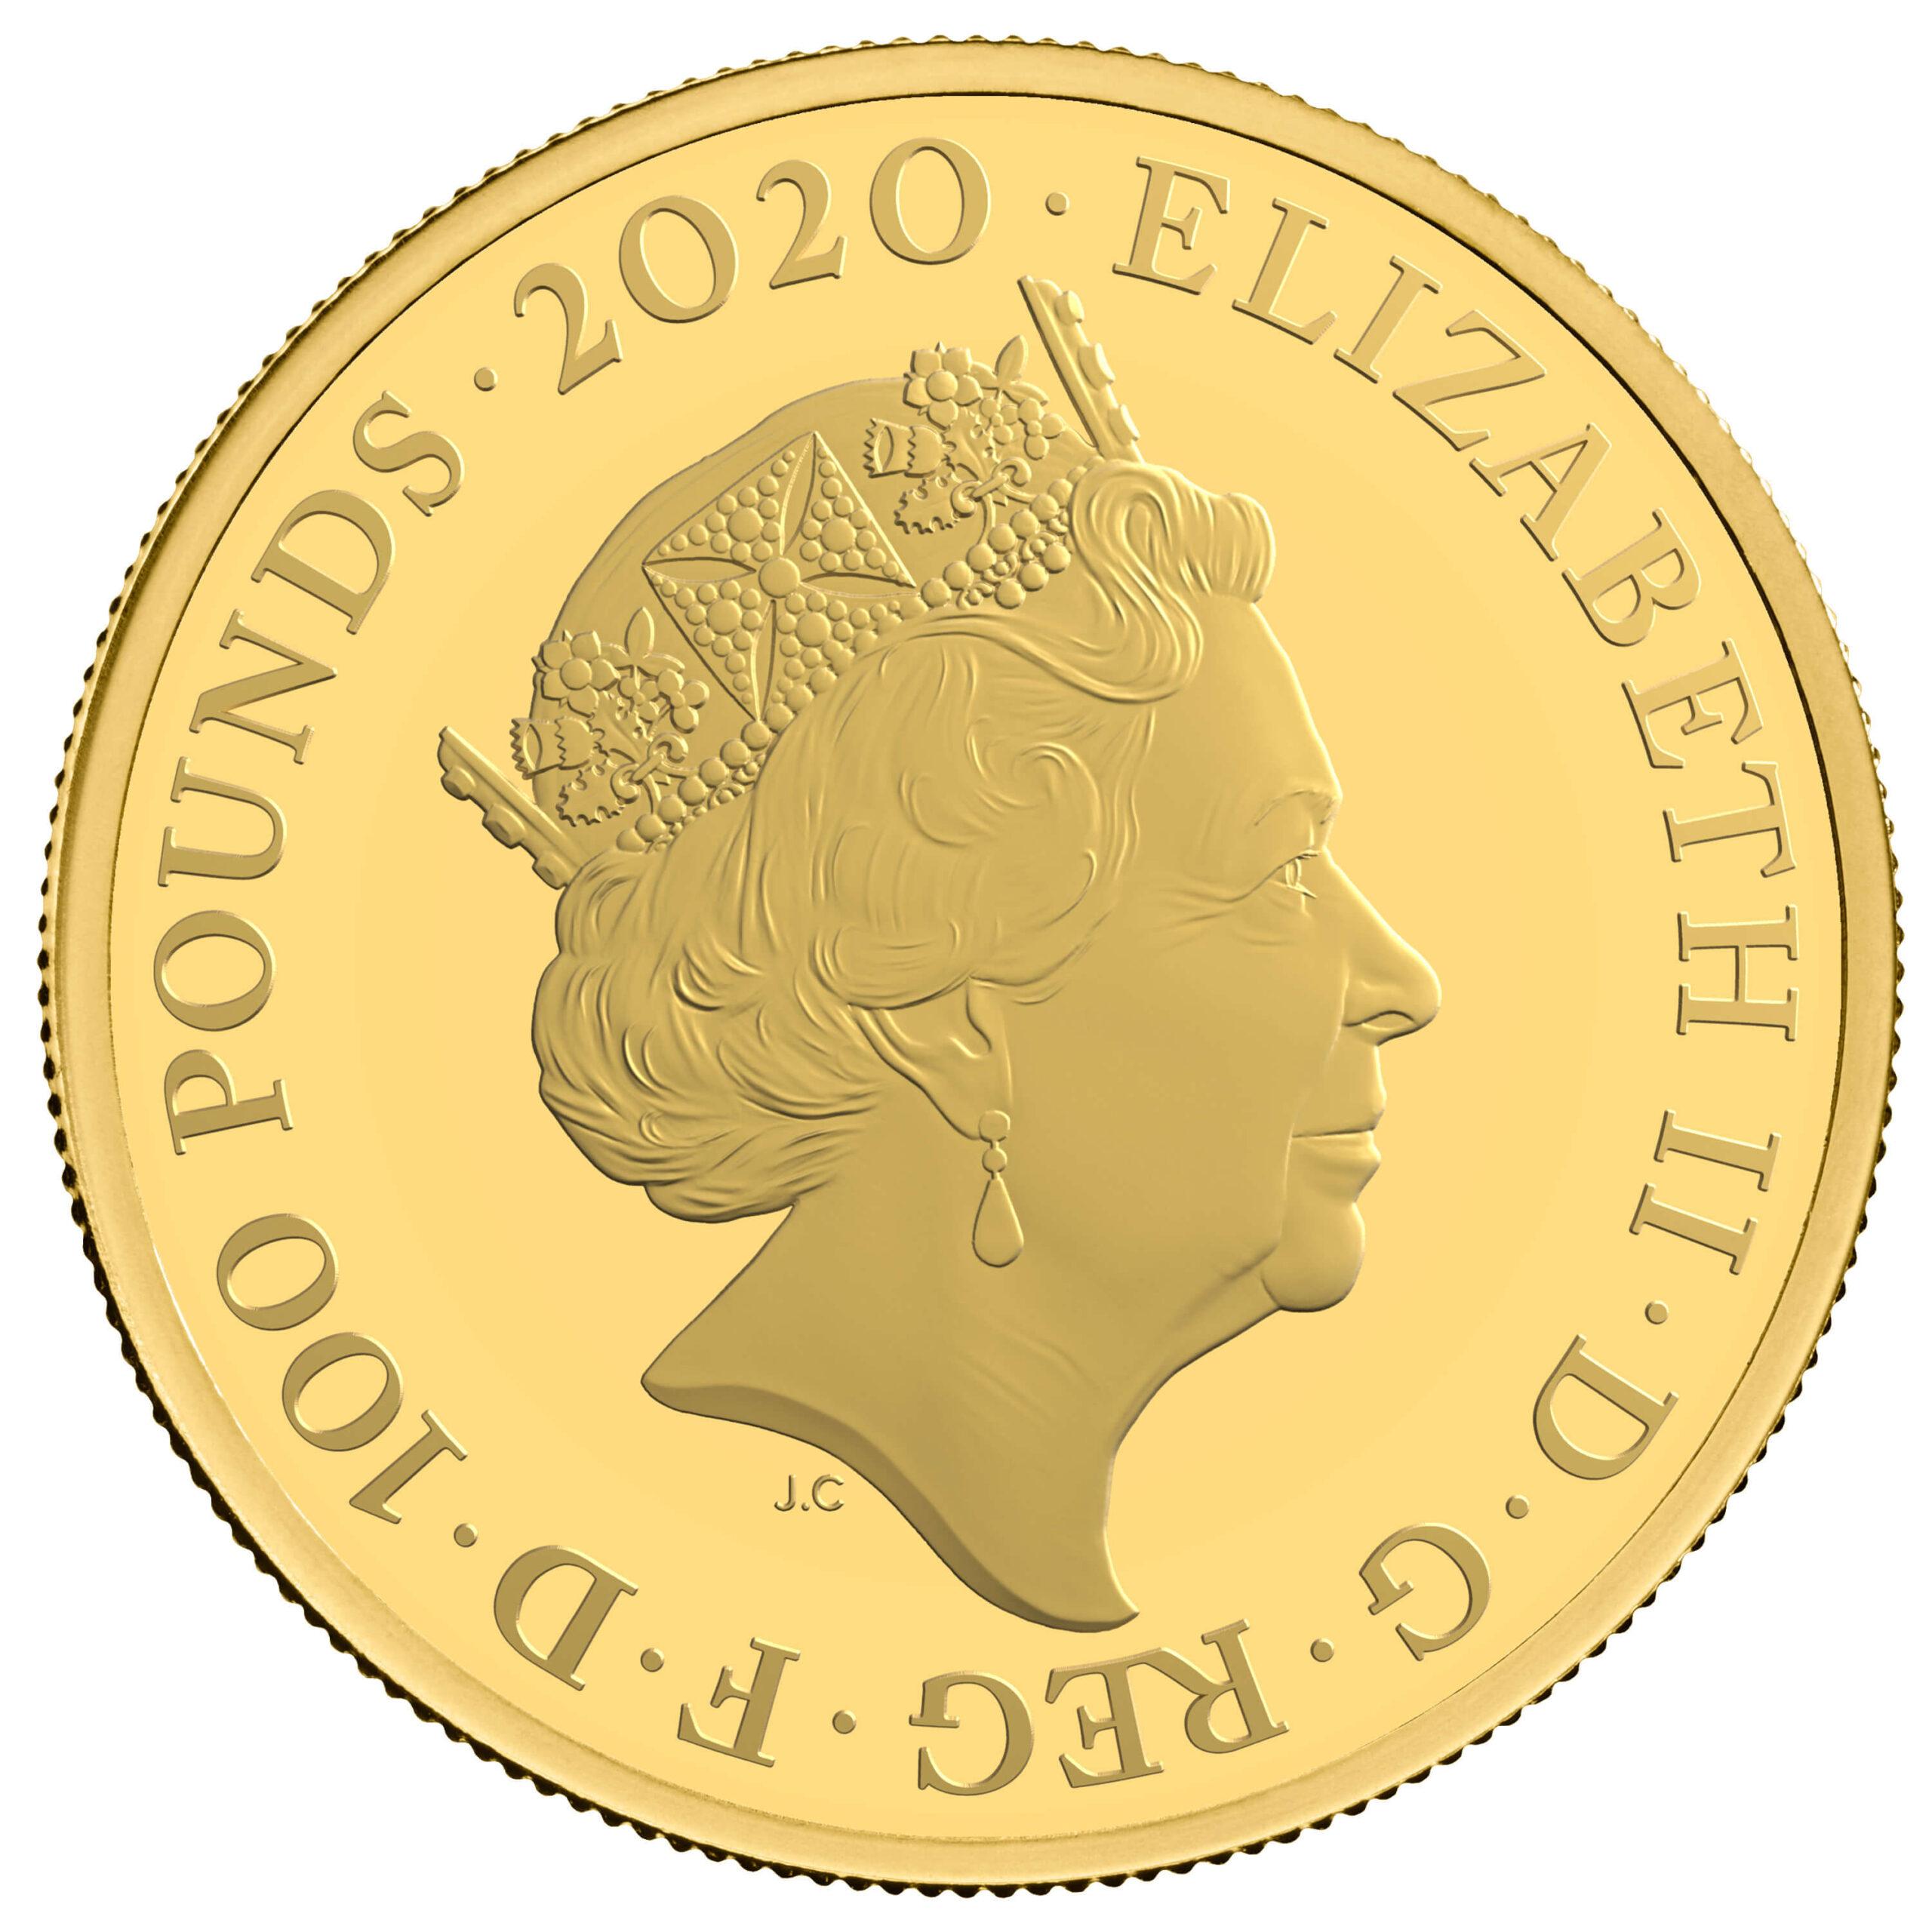 GB 100 Pounds 2020